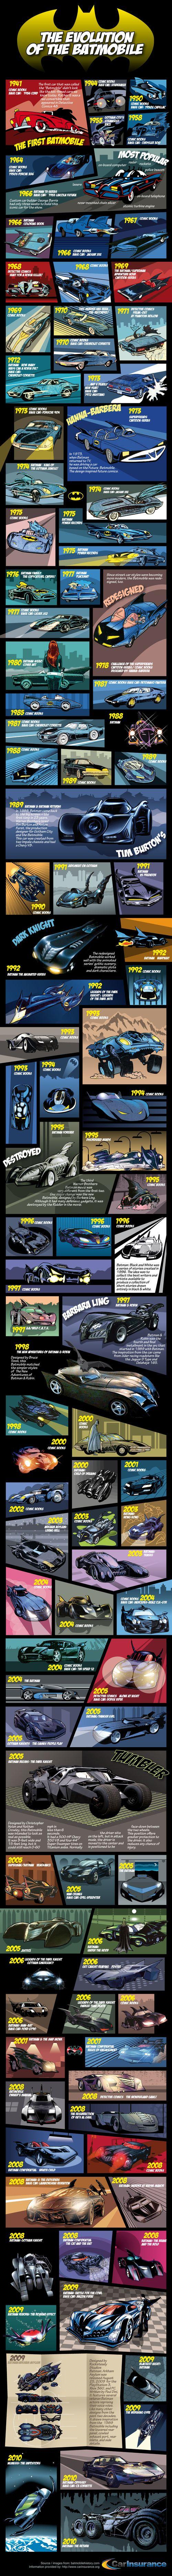 History of the Batmobile --- #Batman: Batmobile Evolution, Batmobile Batman, Batman Infographic, Dc Comic, Comic Book, Dark Knight, Batmobile Infographic, Superhero